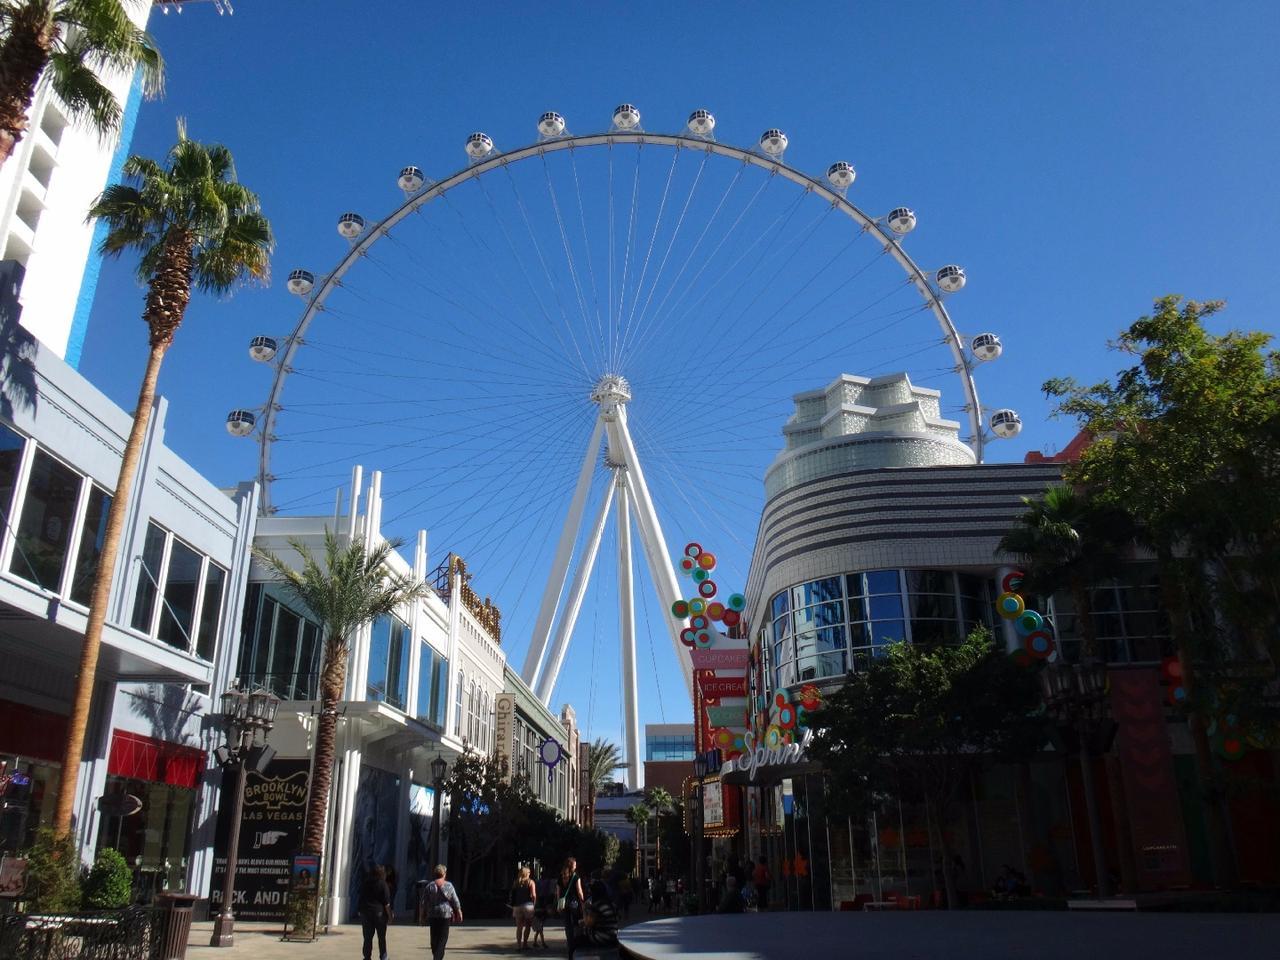 The Vegas High Roller, Las Vegas, USA (by Arup)